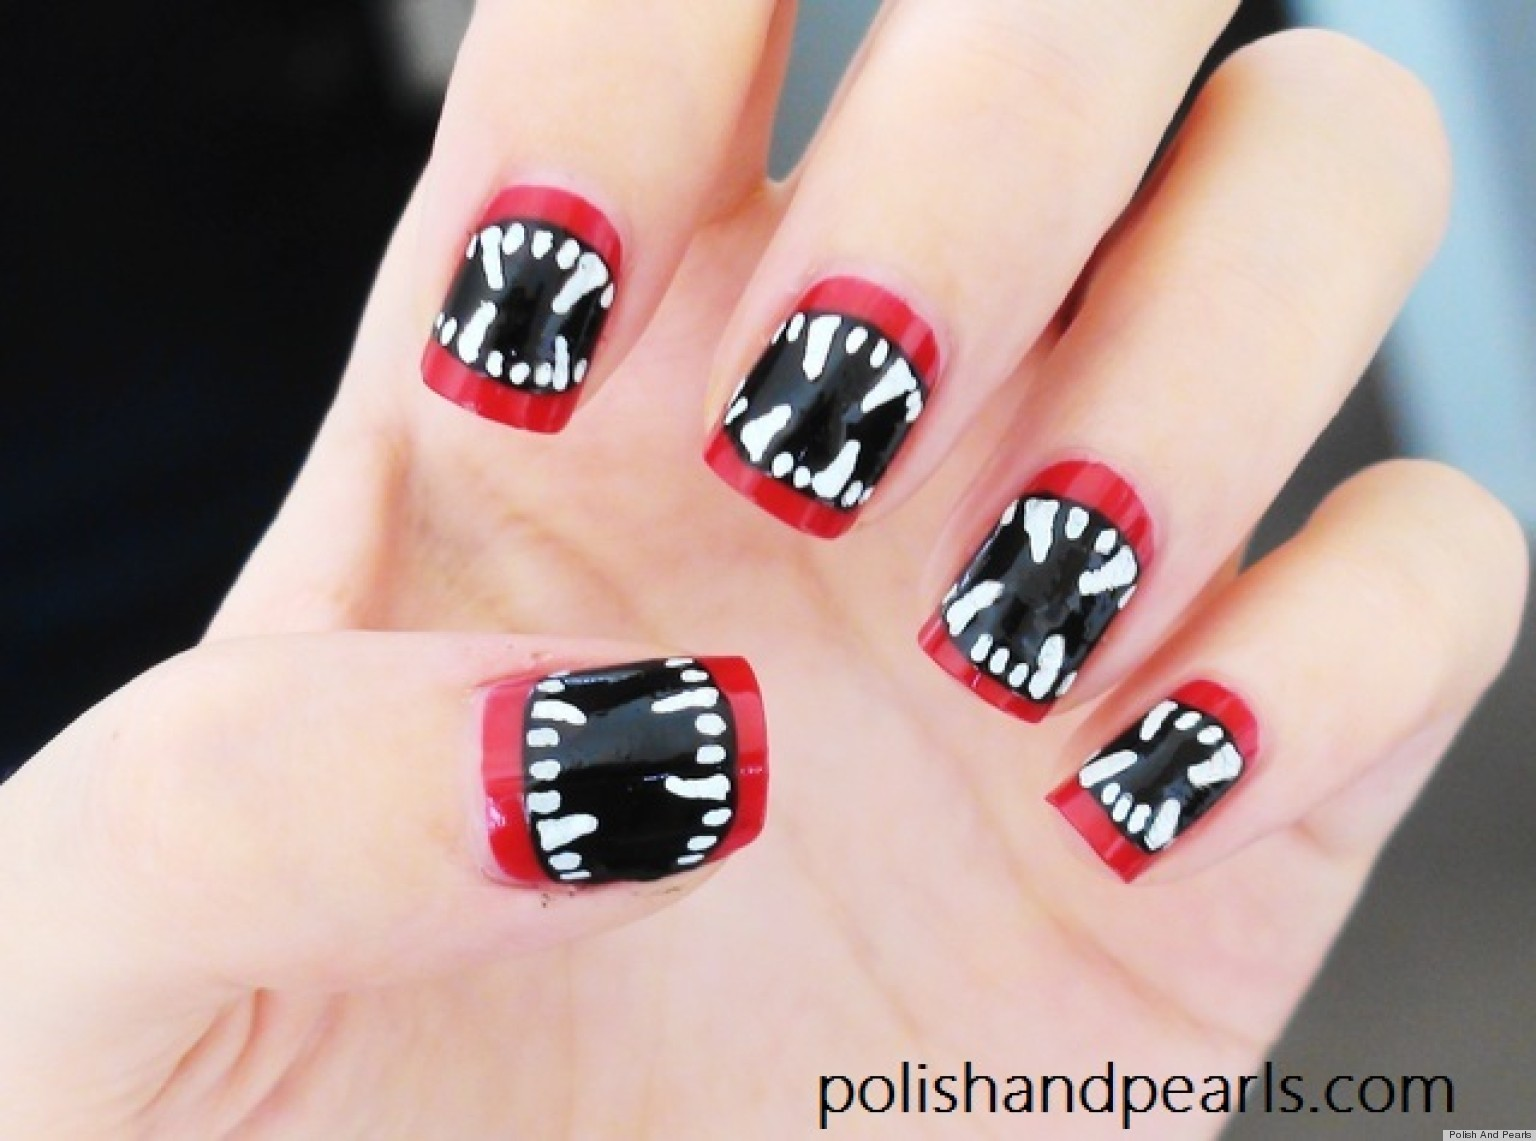 Diy nail art halloween inspired vampire fangs manicure video diy nail art halloween inspired vampire fangs manicure video huffpost prinsesfo Choice Image